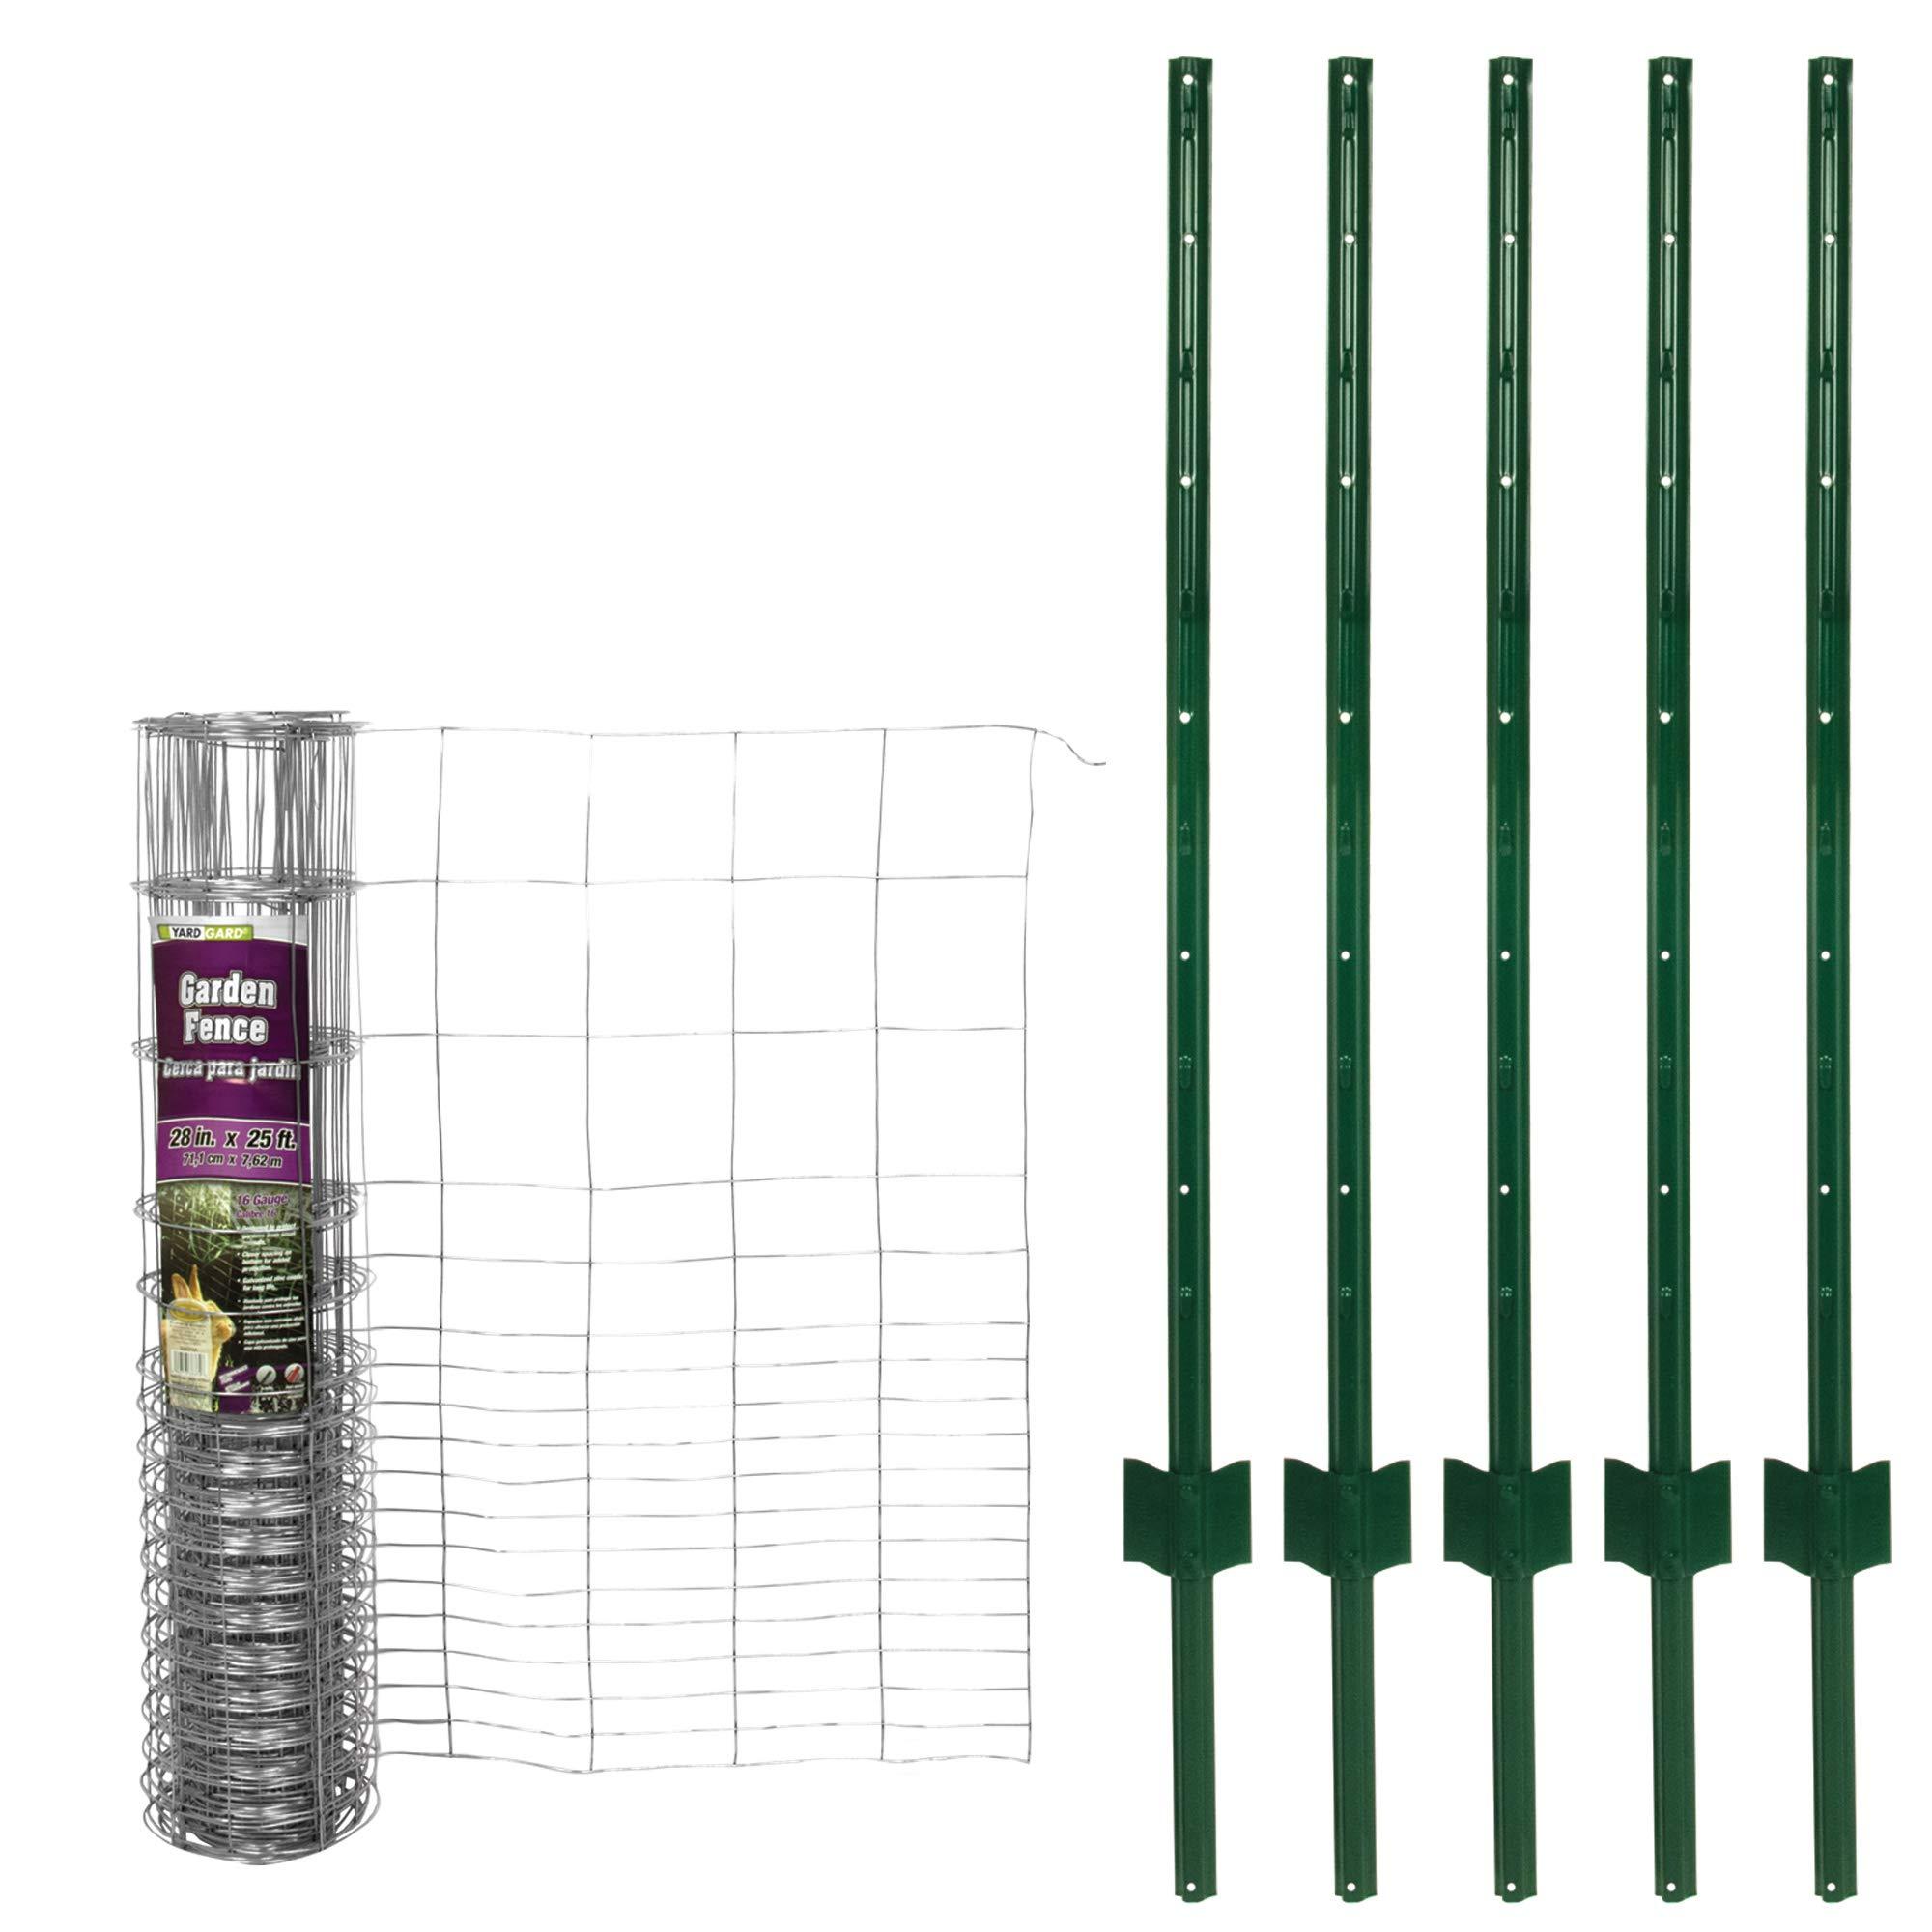 YARDGARD 308374KIT 28 in. x 25 Rabbit 5 x 4 Ft. U Combo Kit Garden Fence with Posts, Grey by YARDGARD (Image #2)